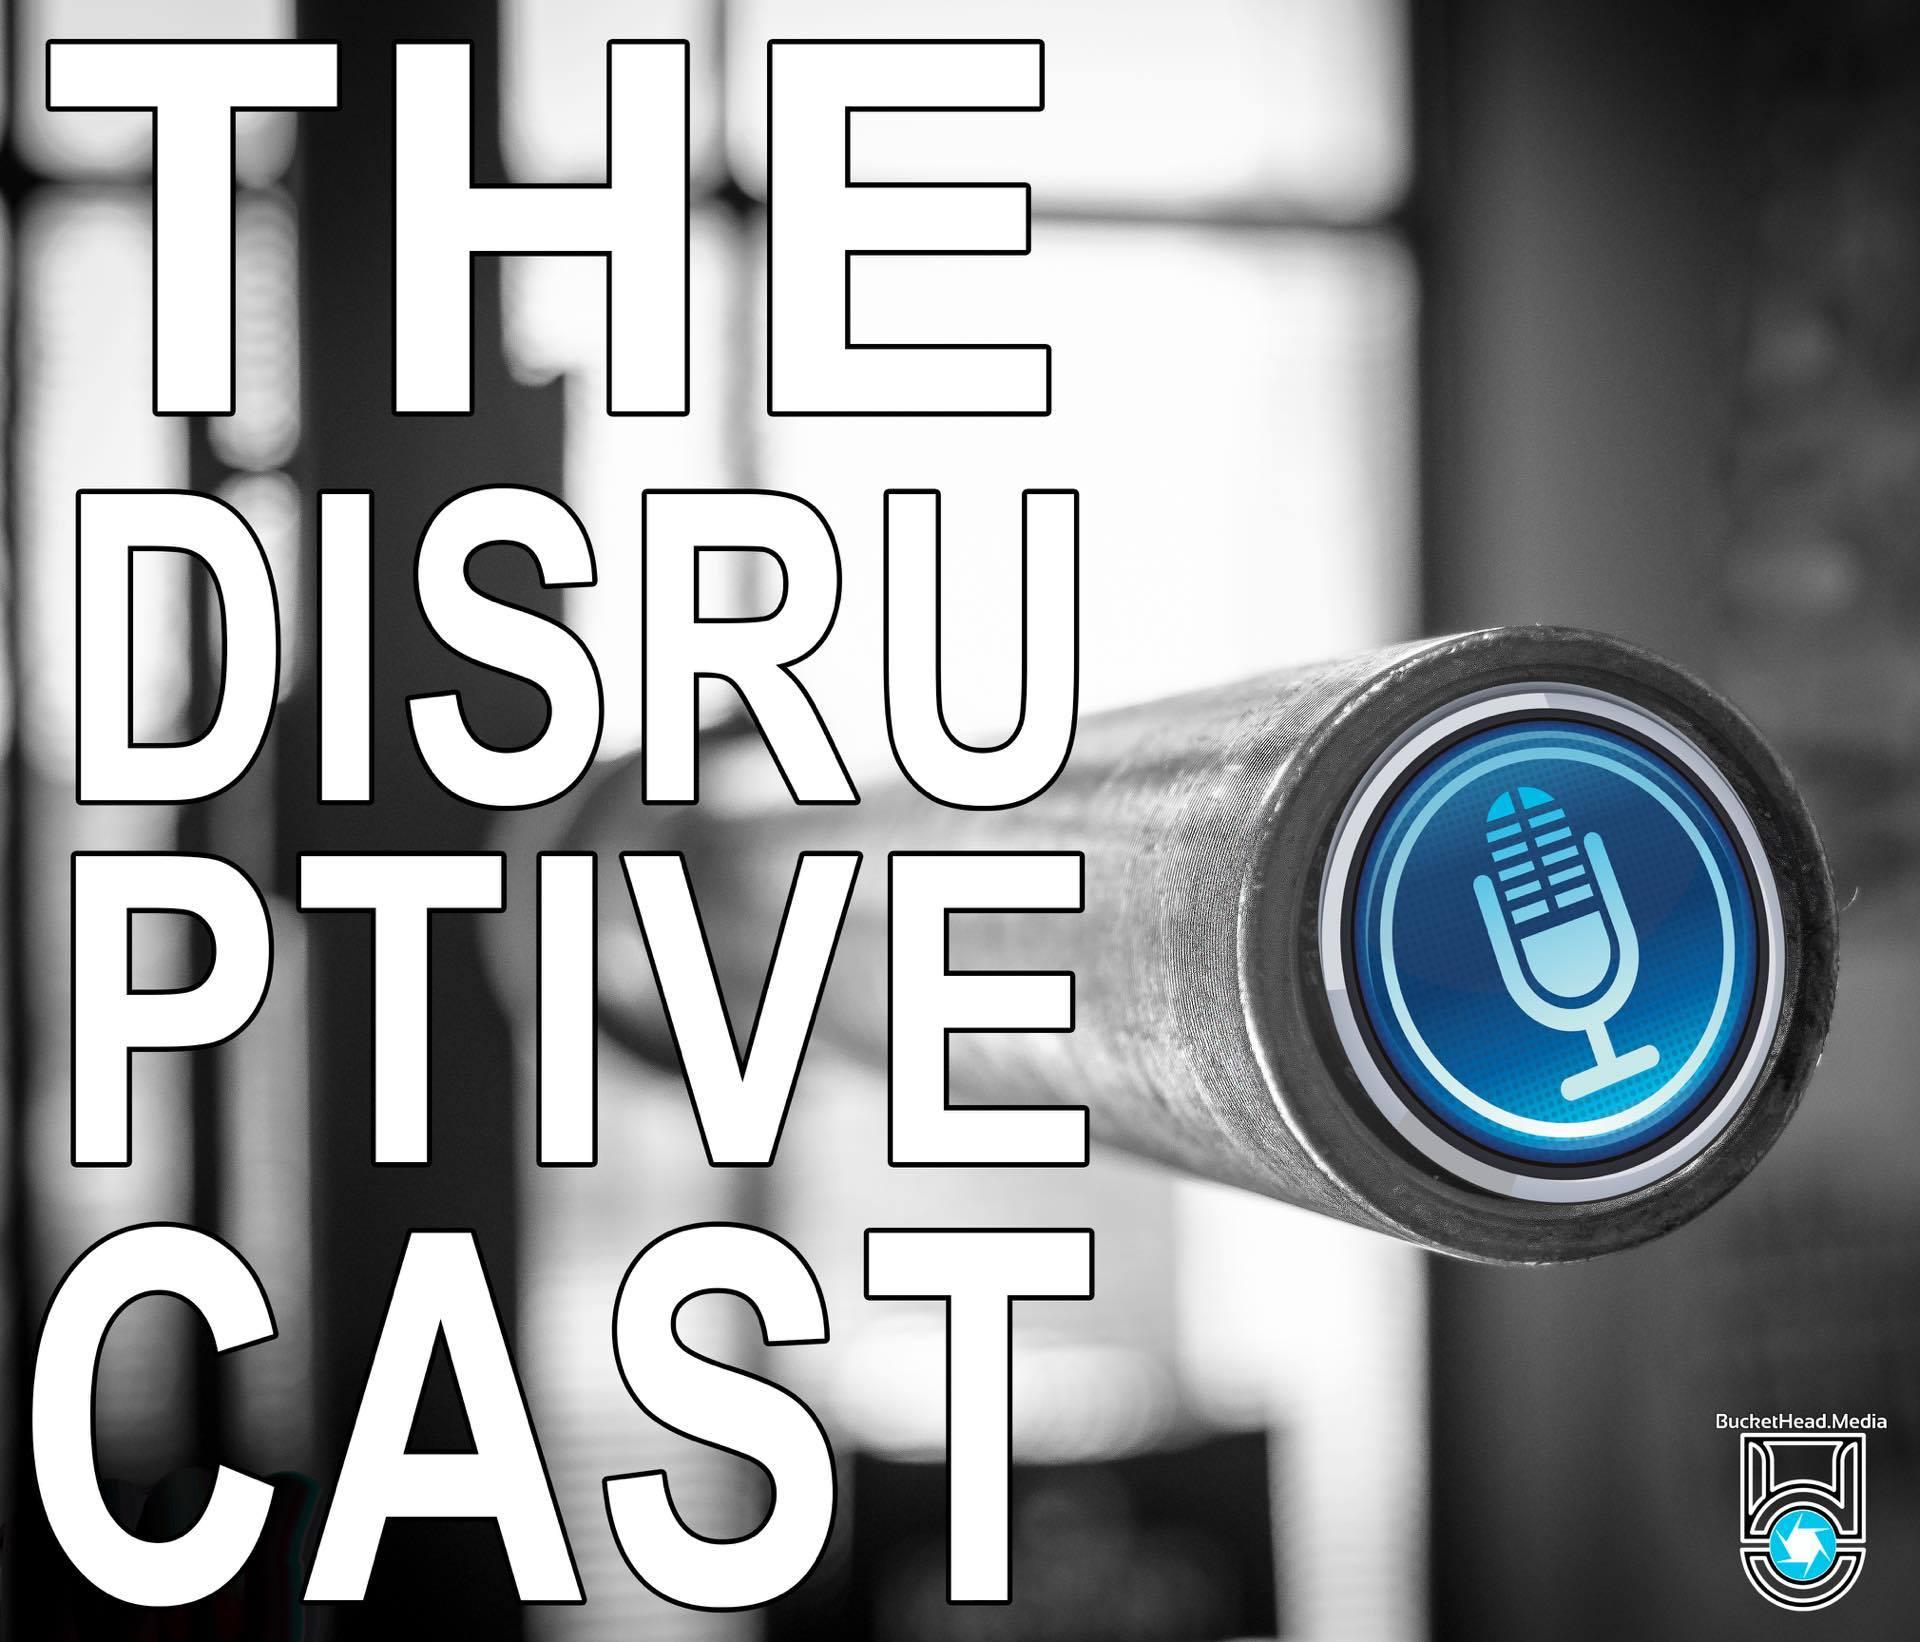 disruptiveCast podcast